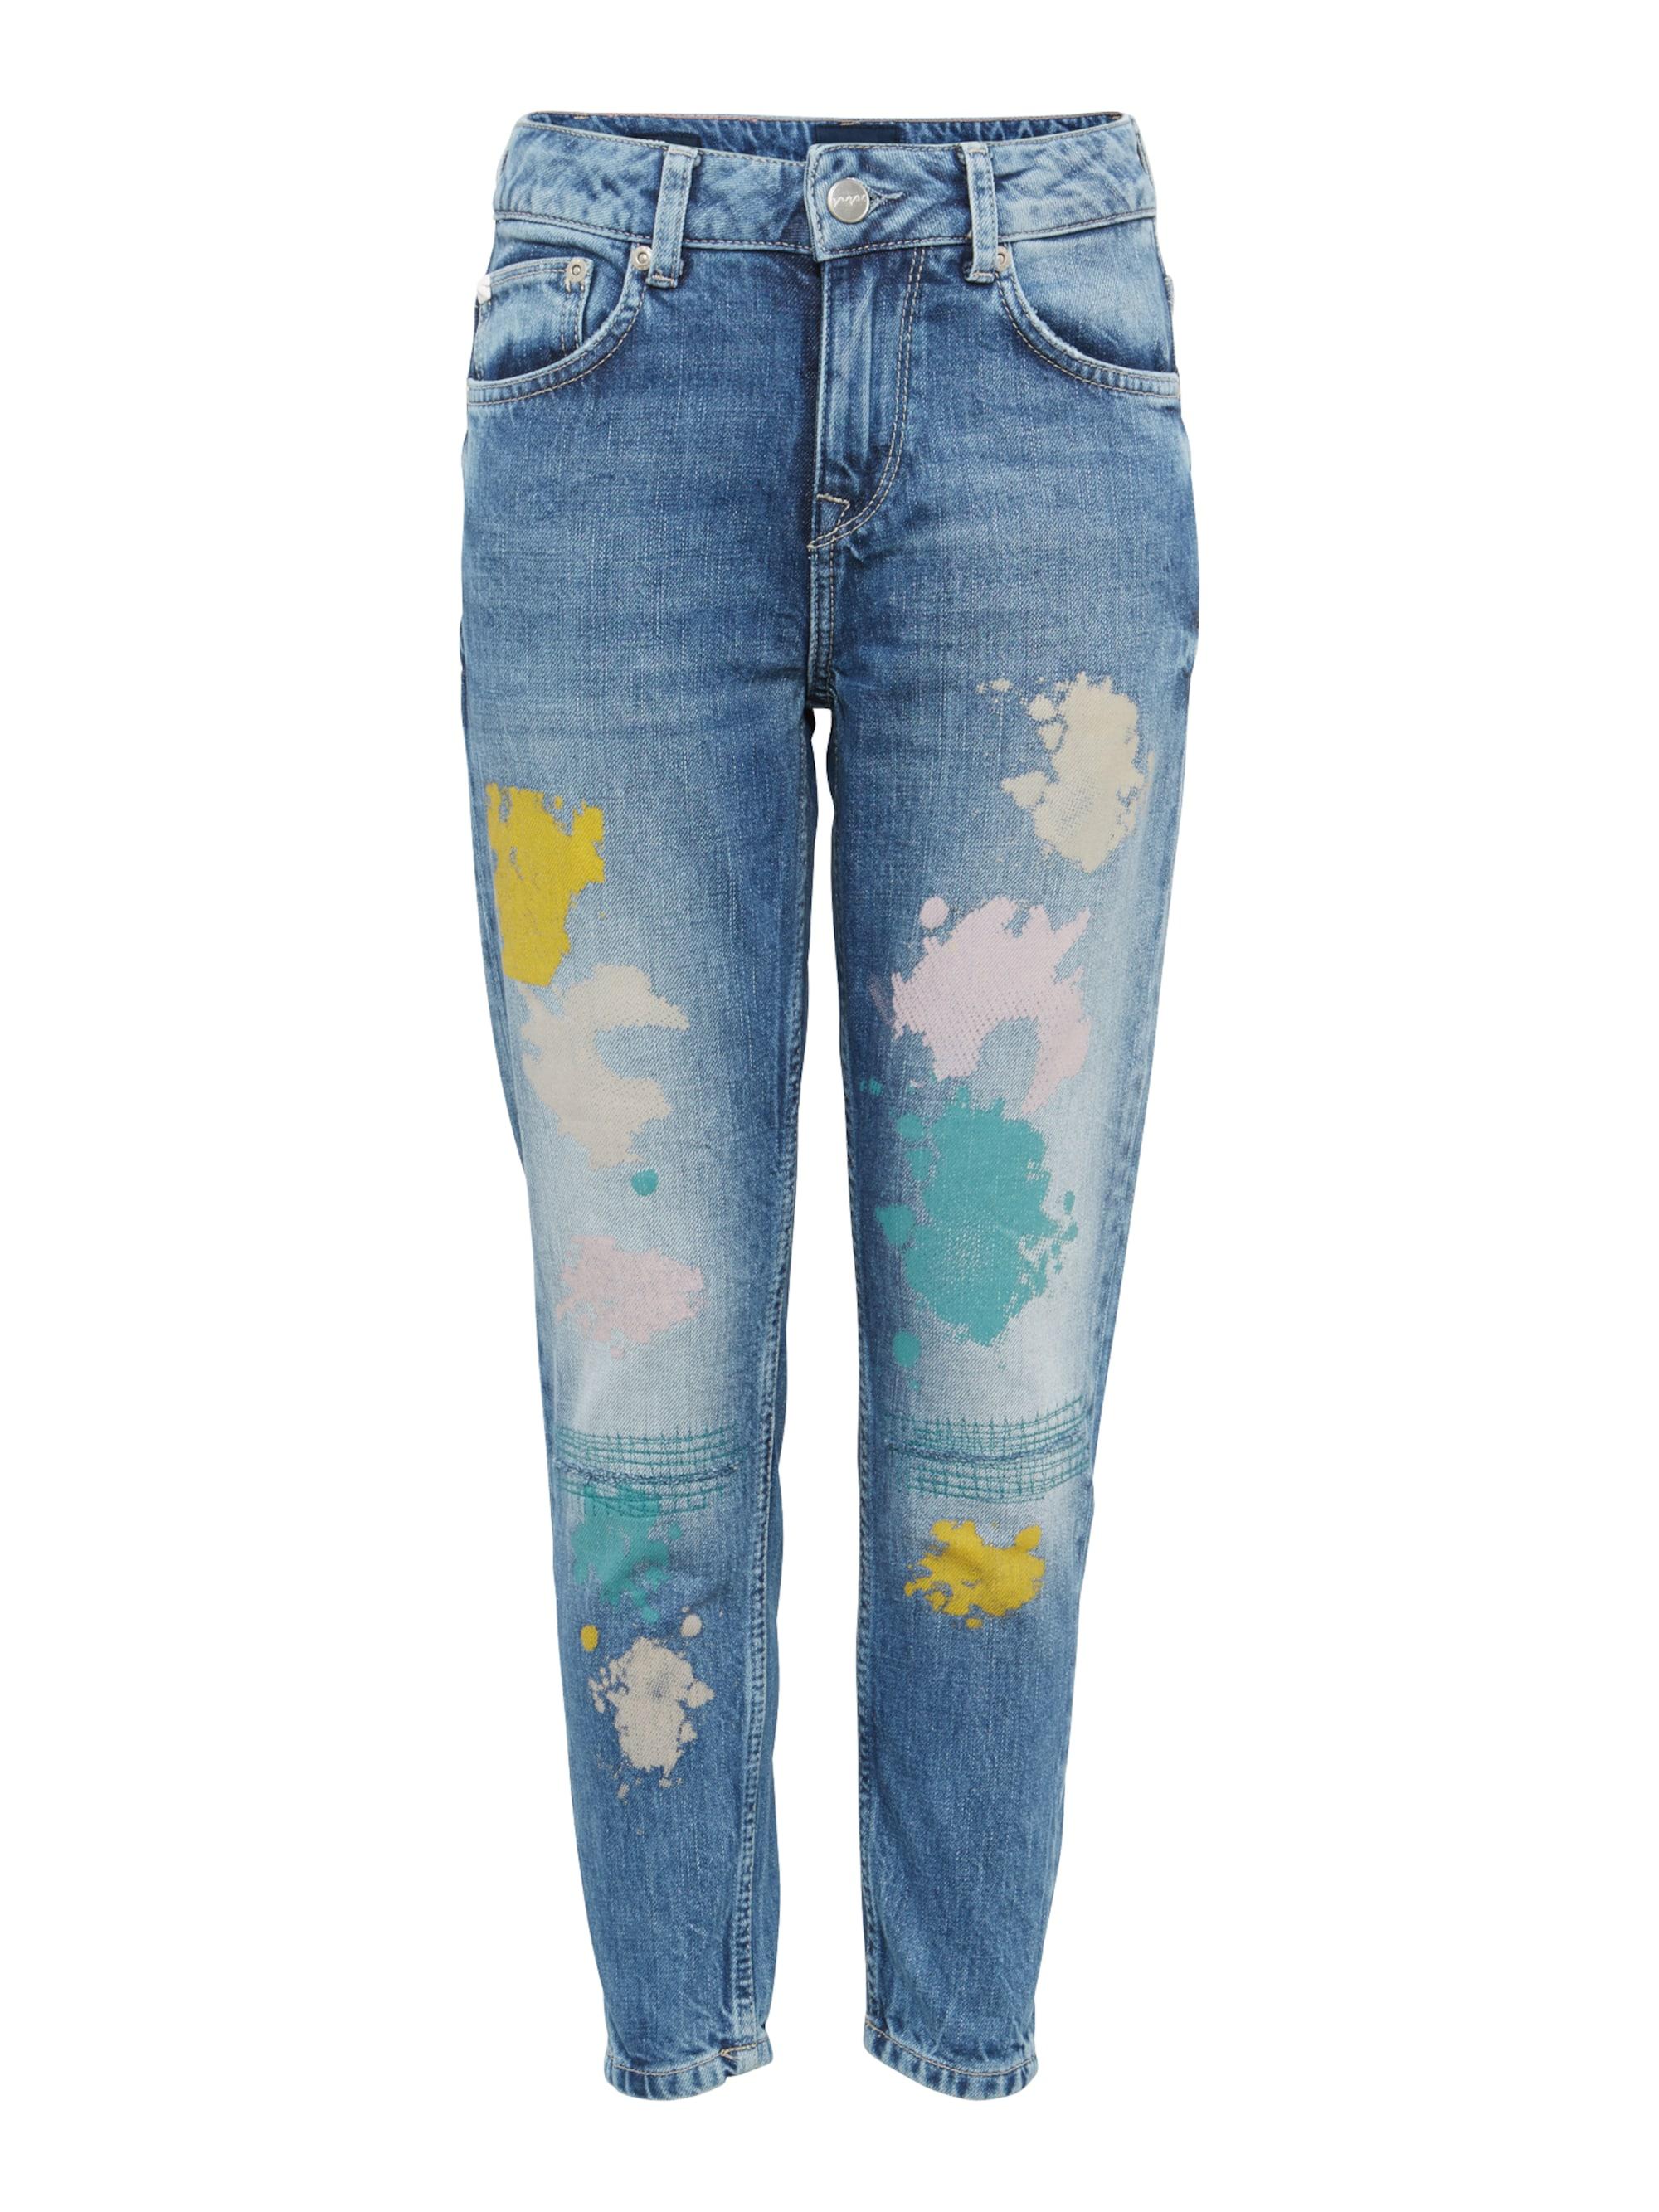 Jeans ´MARGE SL SPOTS´